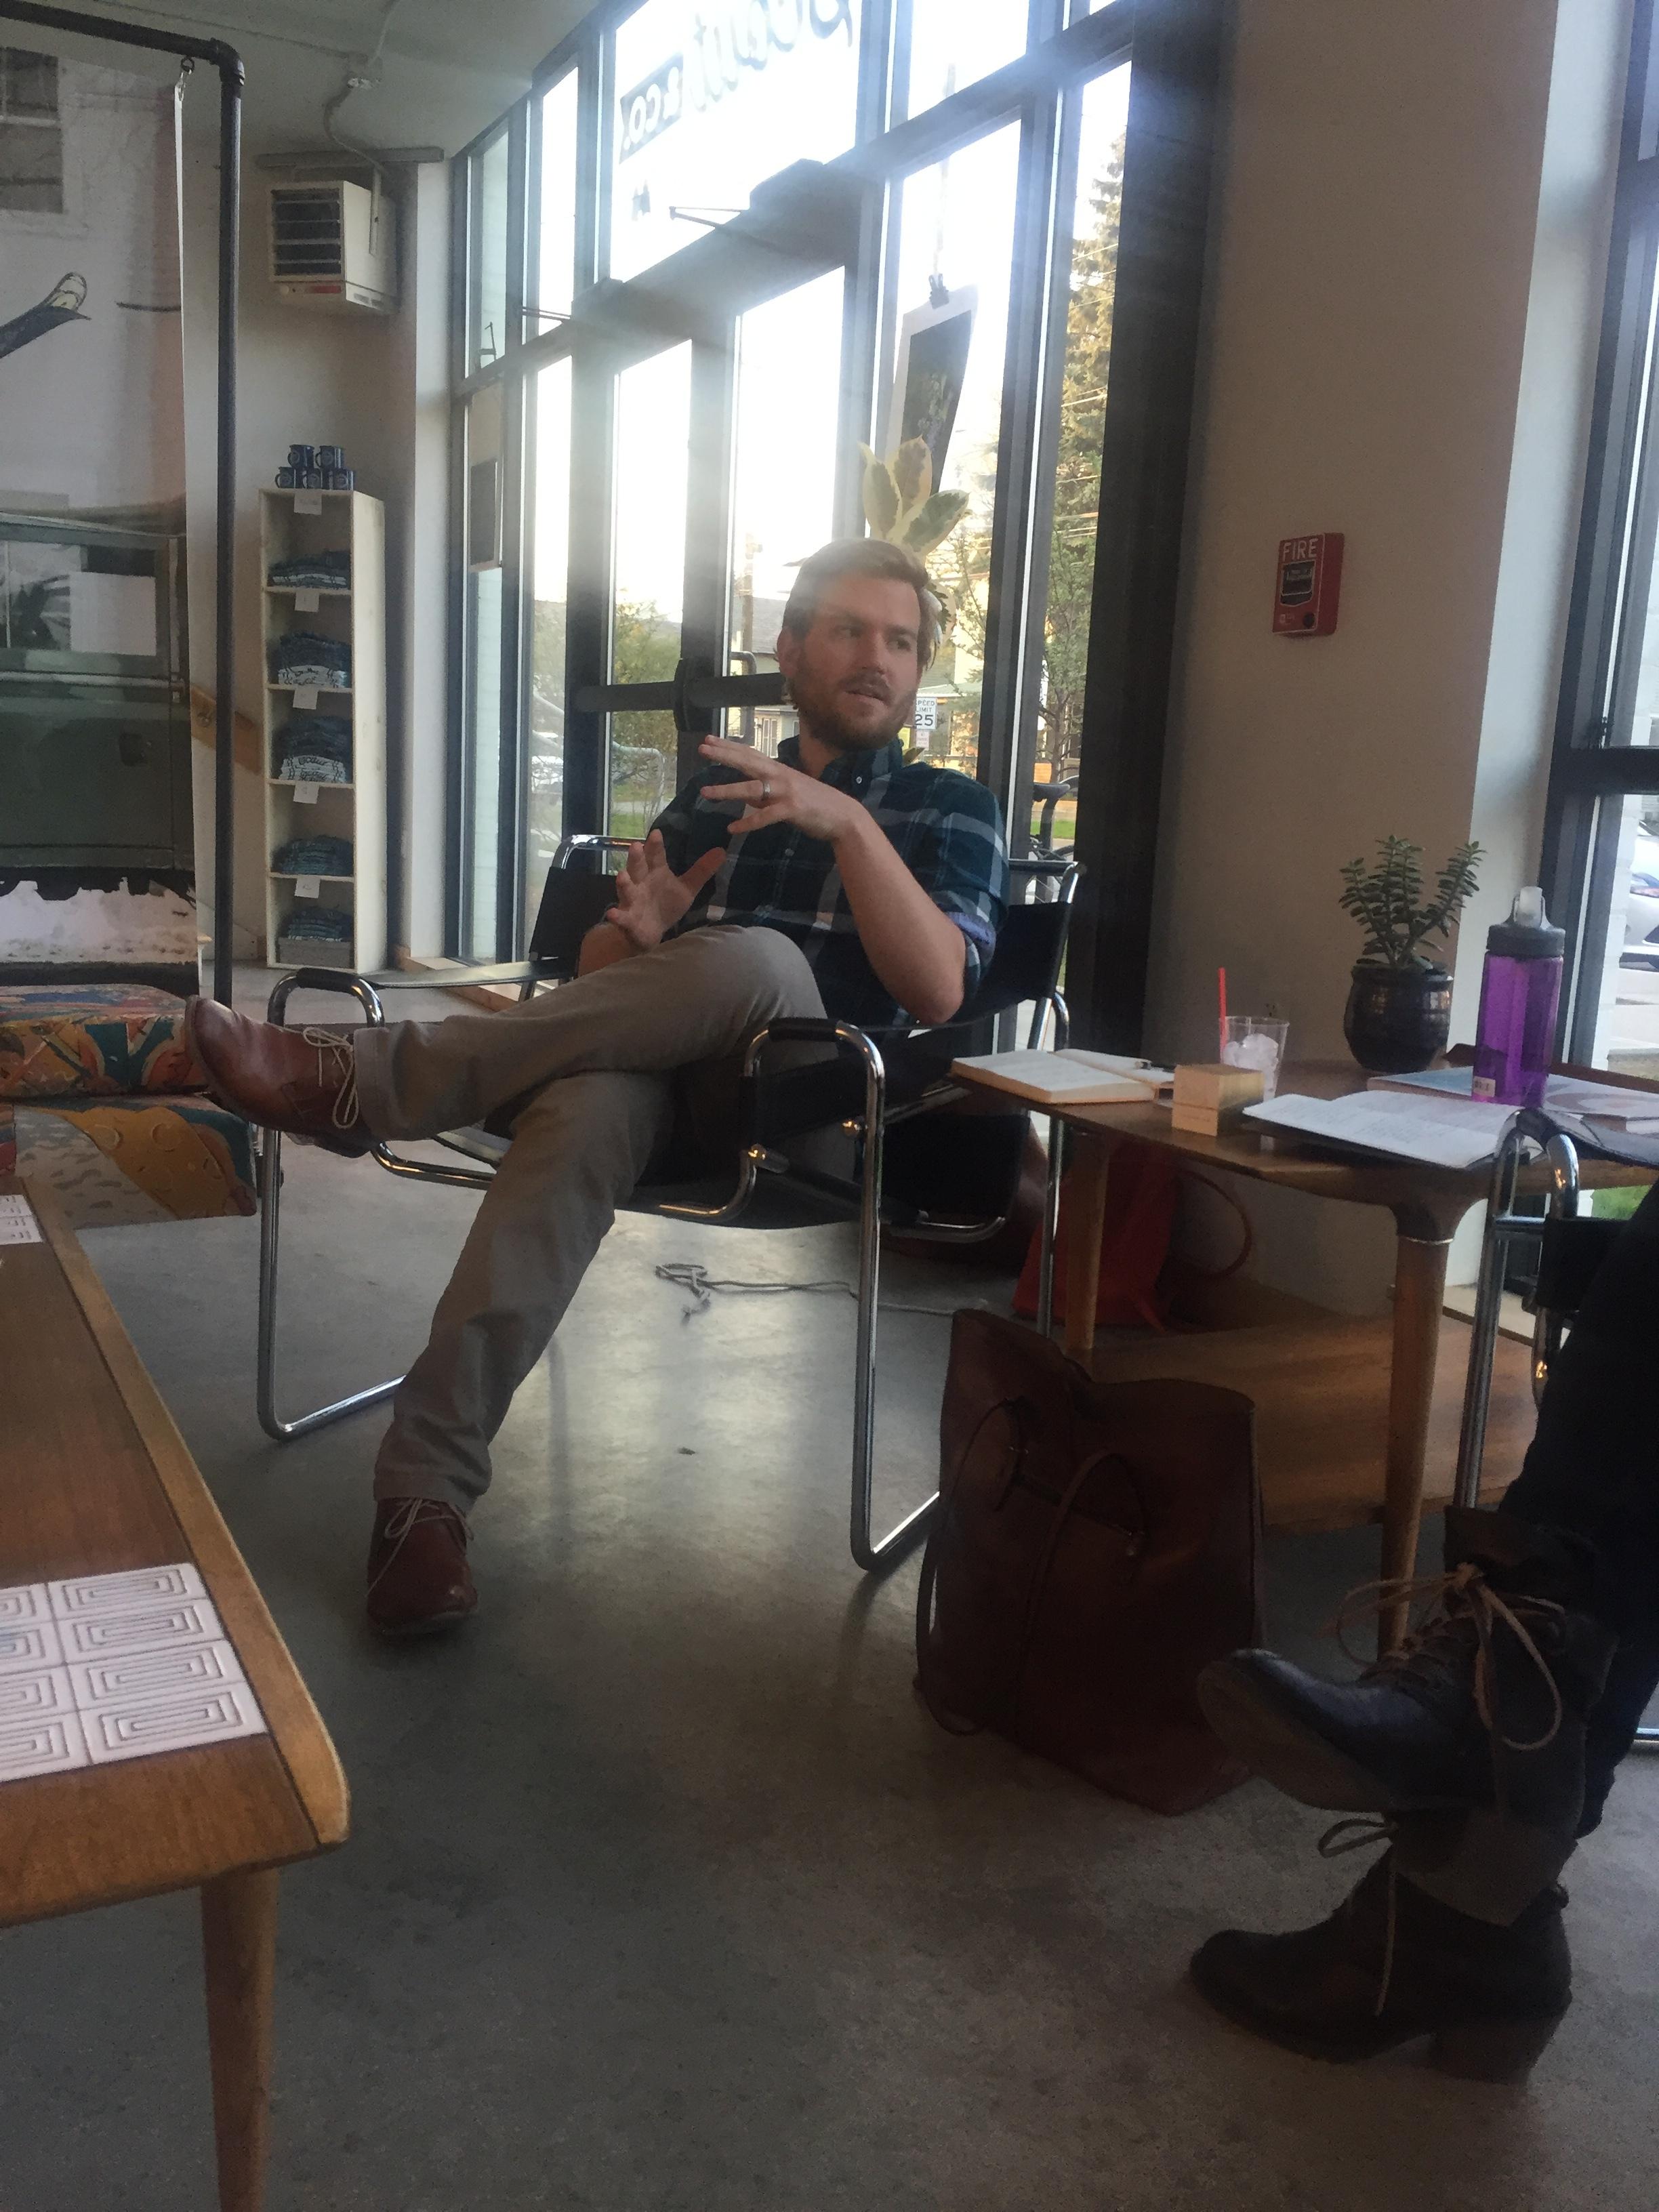 Ian Johnson of Birdwalk Press